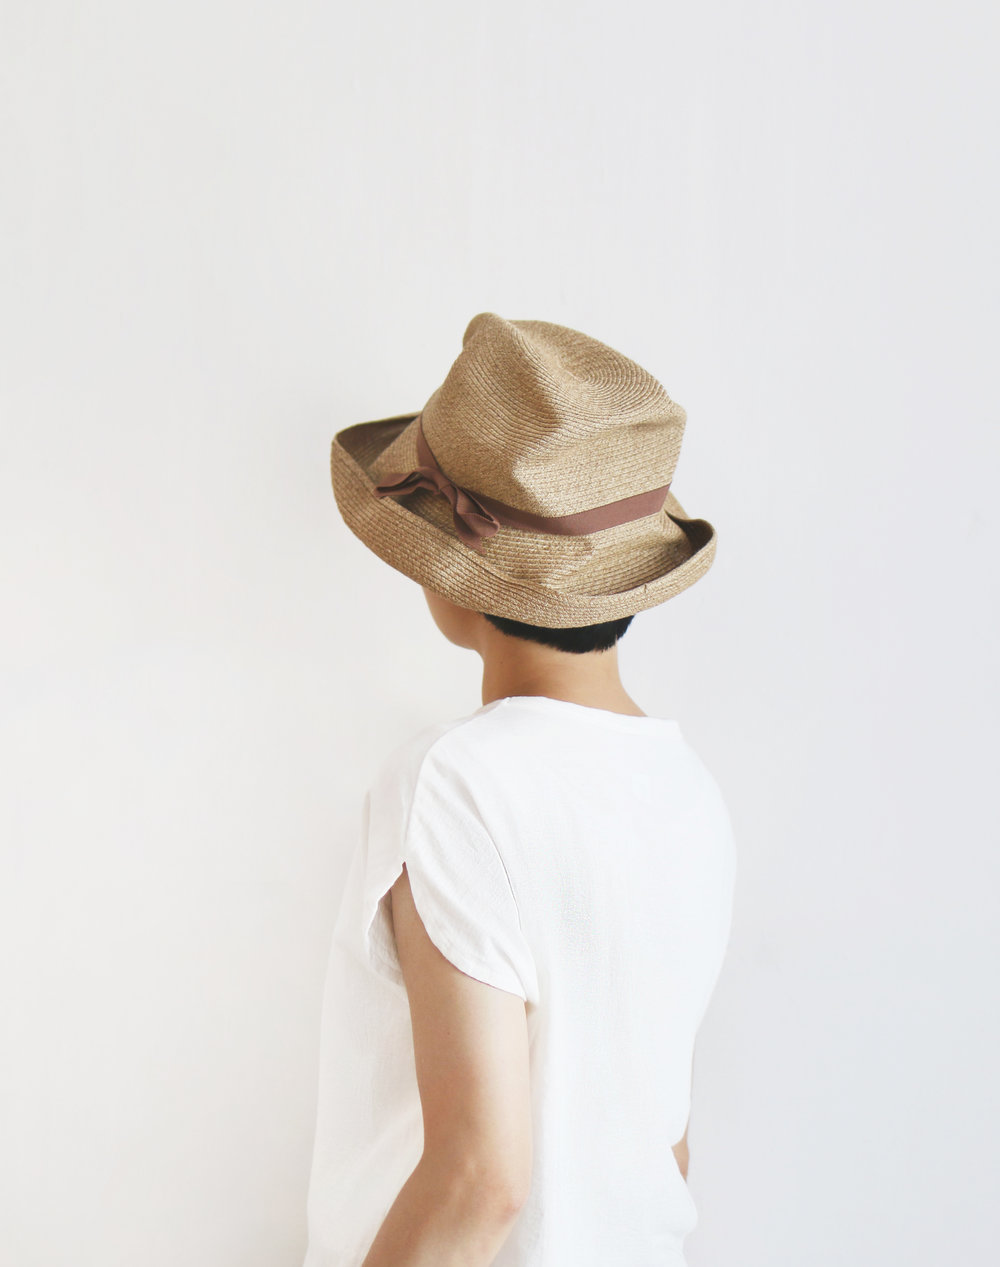 Mature Ha. 盒帽 (帽簷寬 11 cm)   職人手工打造的「盒帽」,將能夠自由塑形摺壓的紙纖帽款收納在一個紙盒當中,成為輕便又好攜帶的帽款。較寬的帽簷若是稍微往上翻起,就能一改俐落線條,以邊緣翻折的巧思帶來趣味性。